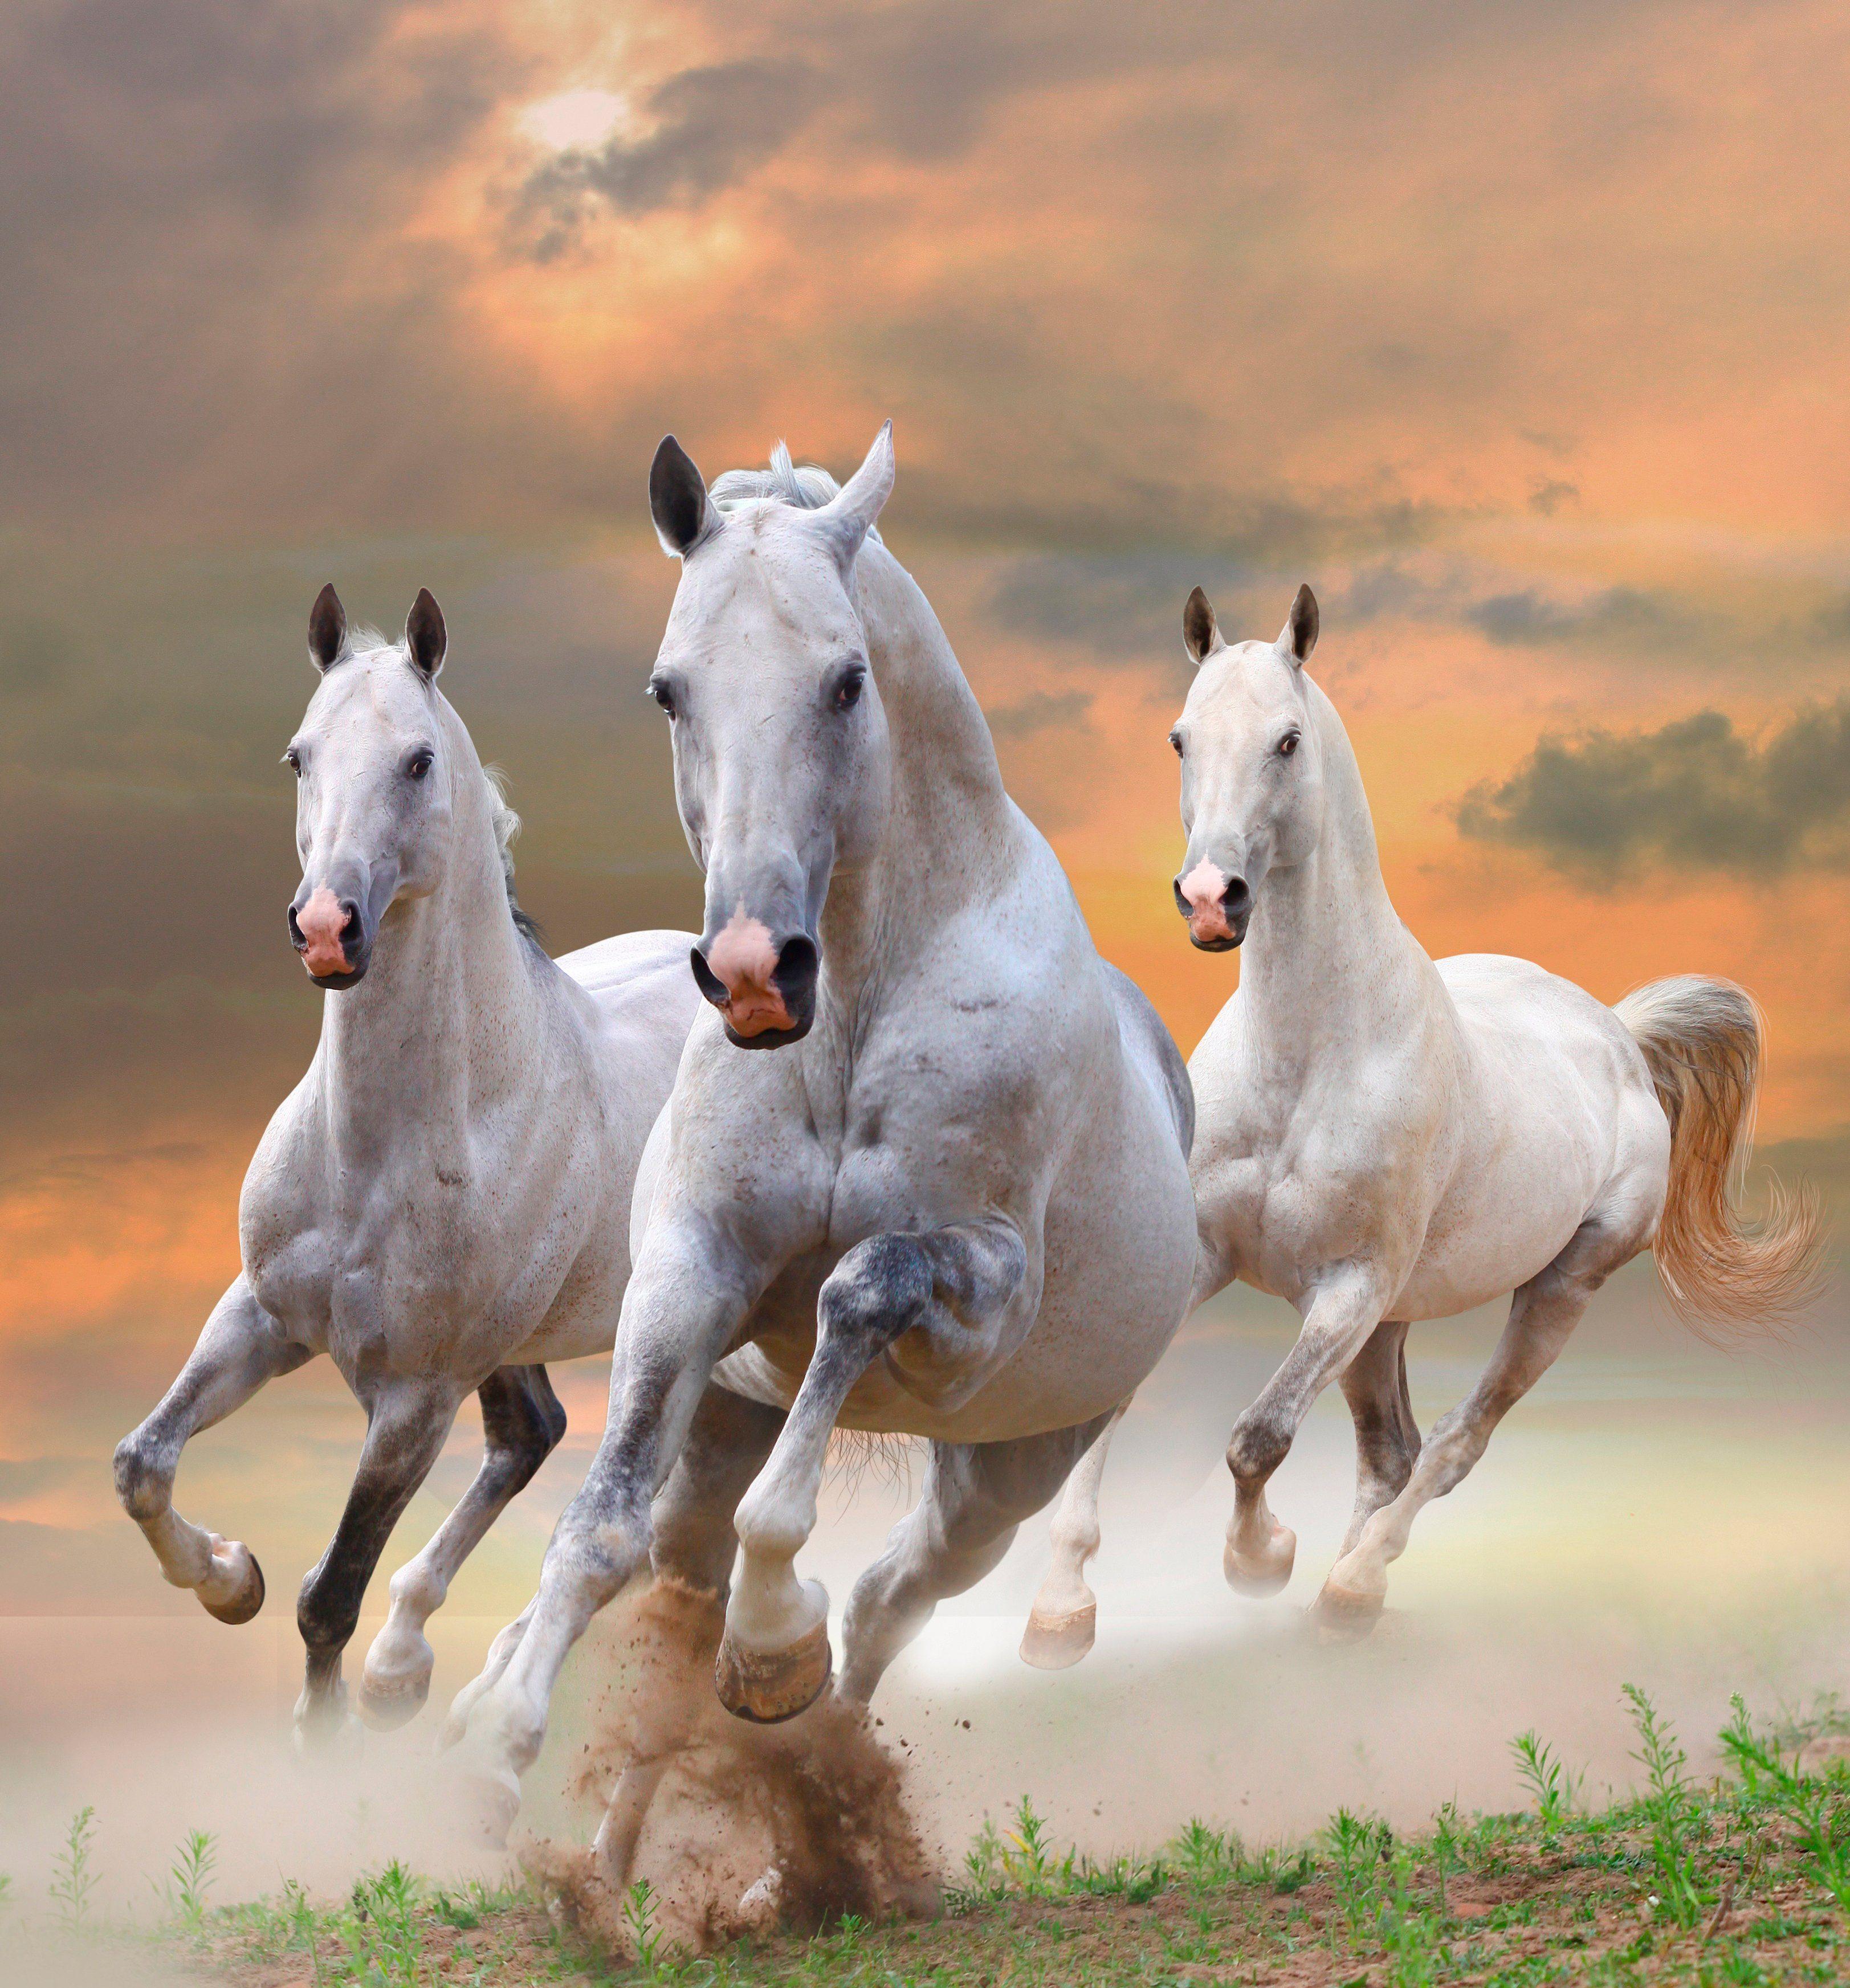 PAPERMOON Fototapete »White Stallions in Dust«, Vlies, 7 Bahnen, 350 x 260 cm